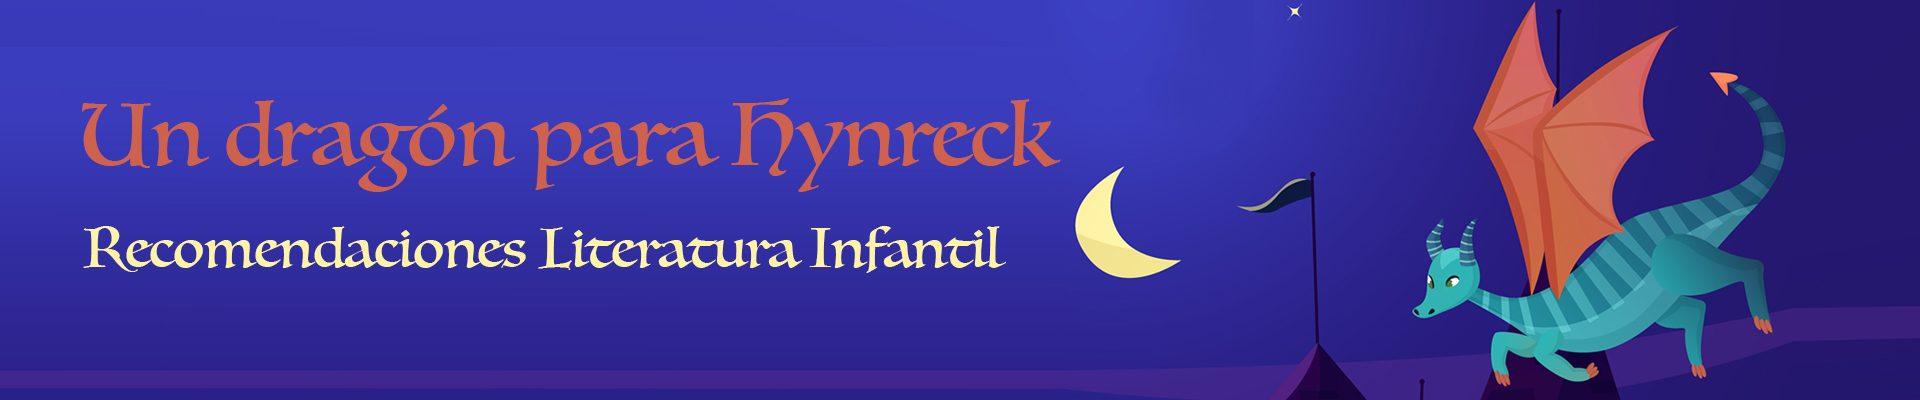 Un dragón para Hynreck